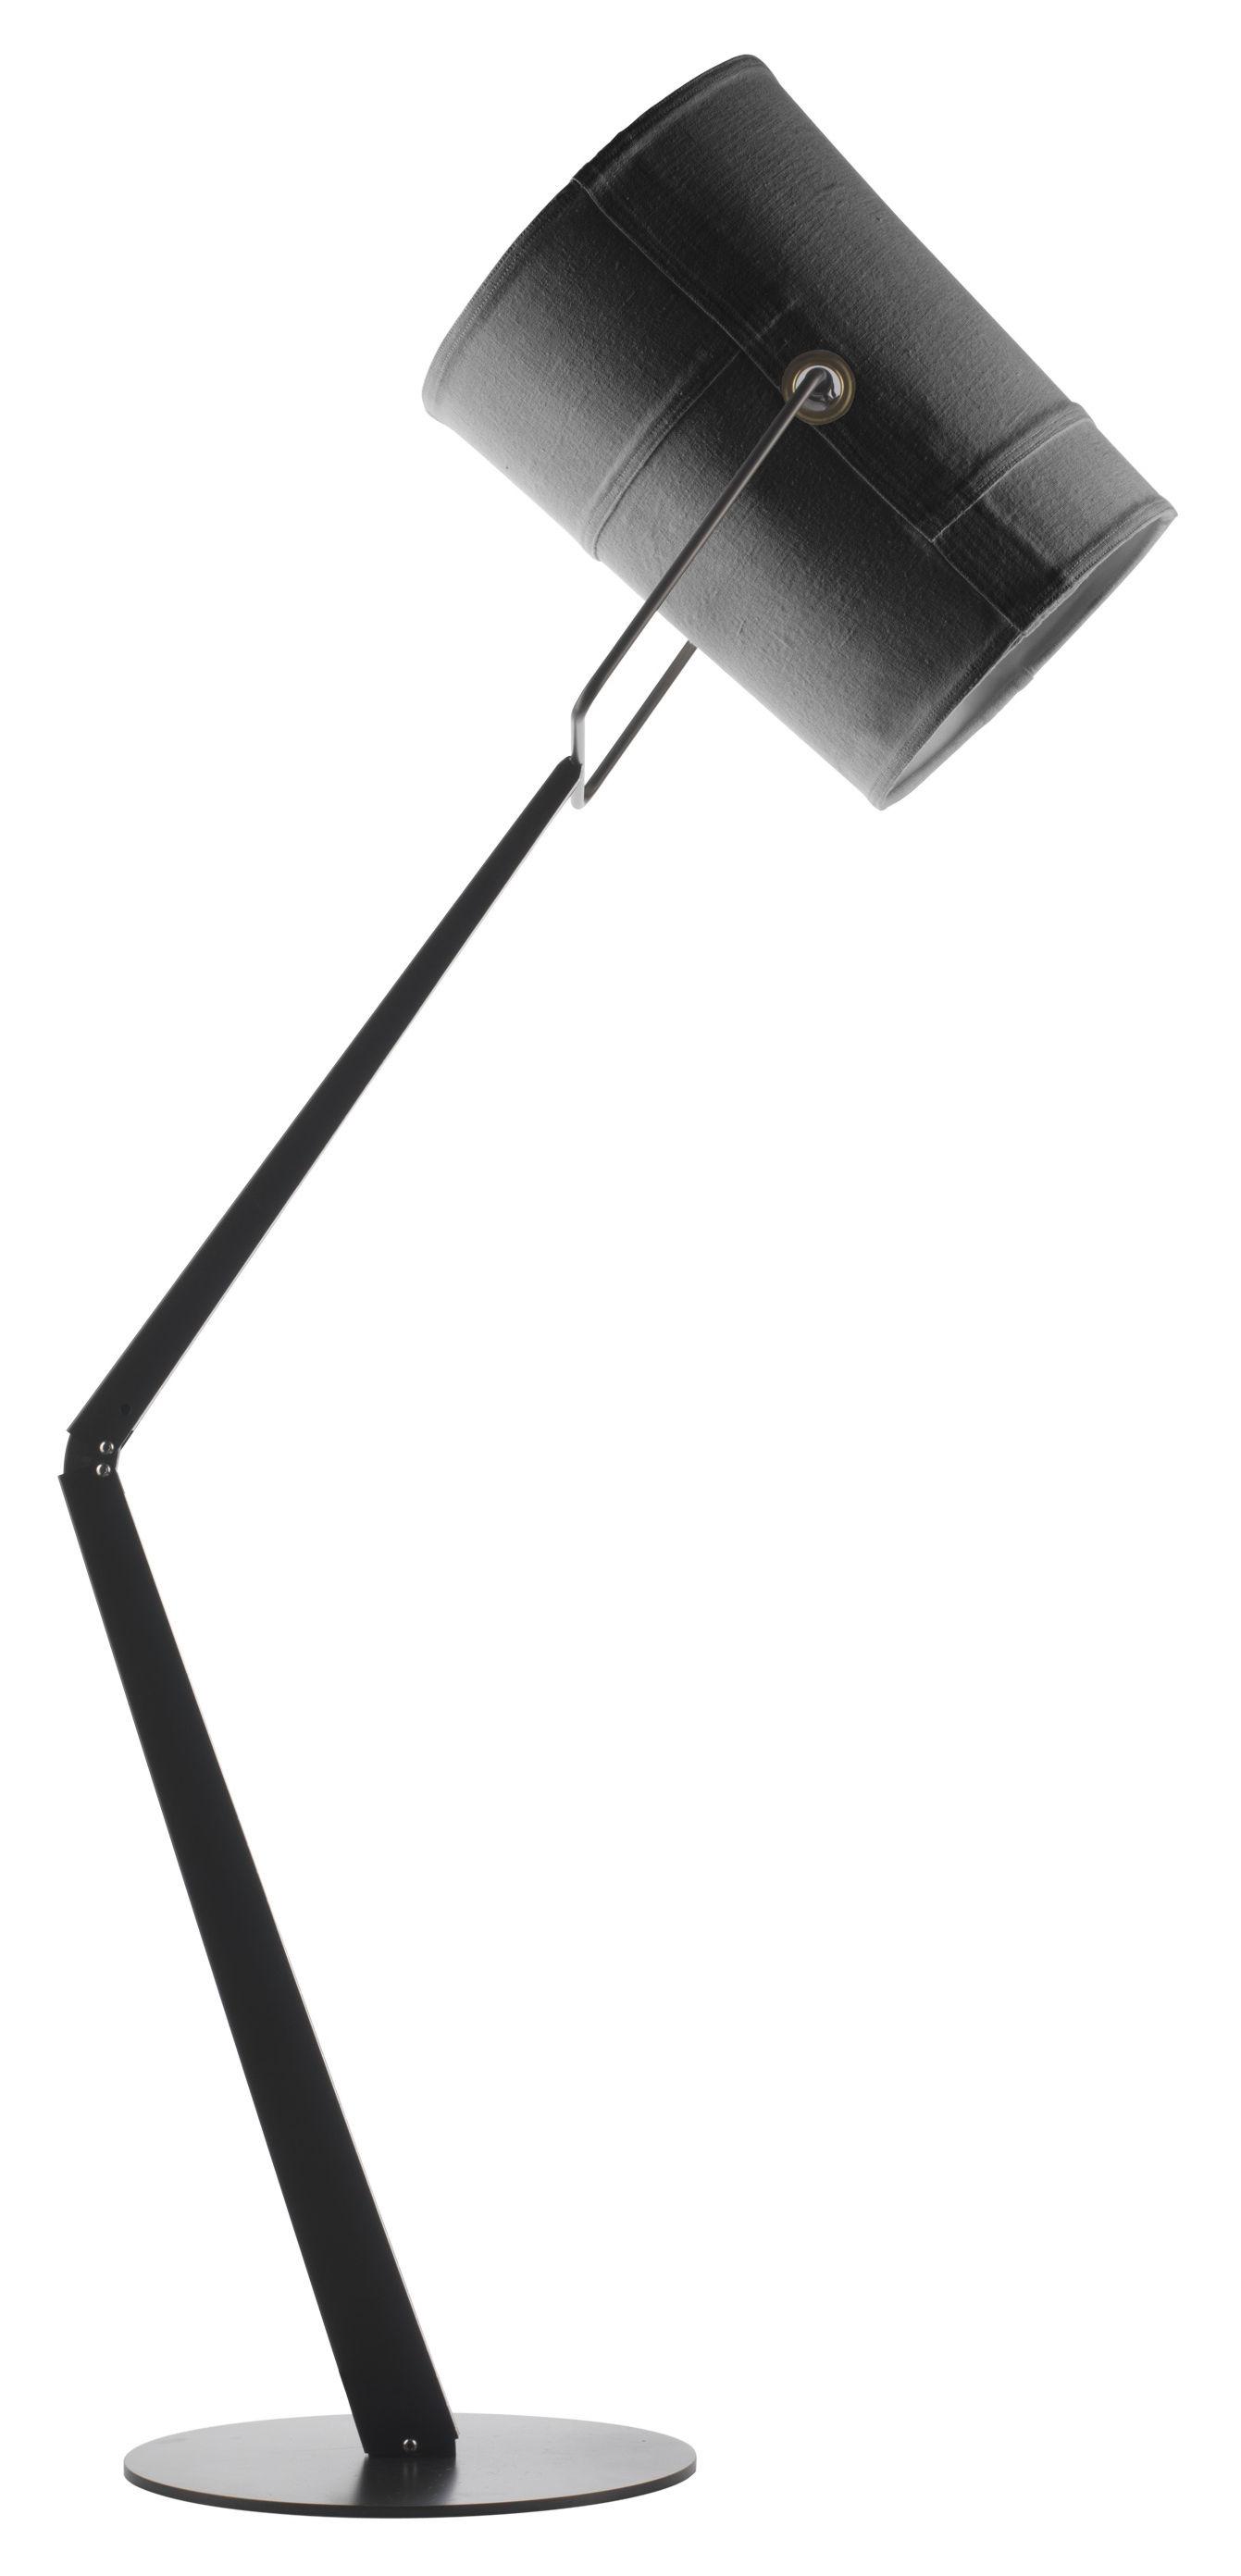 Luminaire - Lampadaires - Lampadaire Fork - Diesel with Foscarini - Gris / Pied marron - Métal anodisé, Tissu